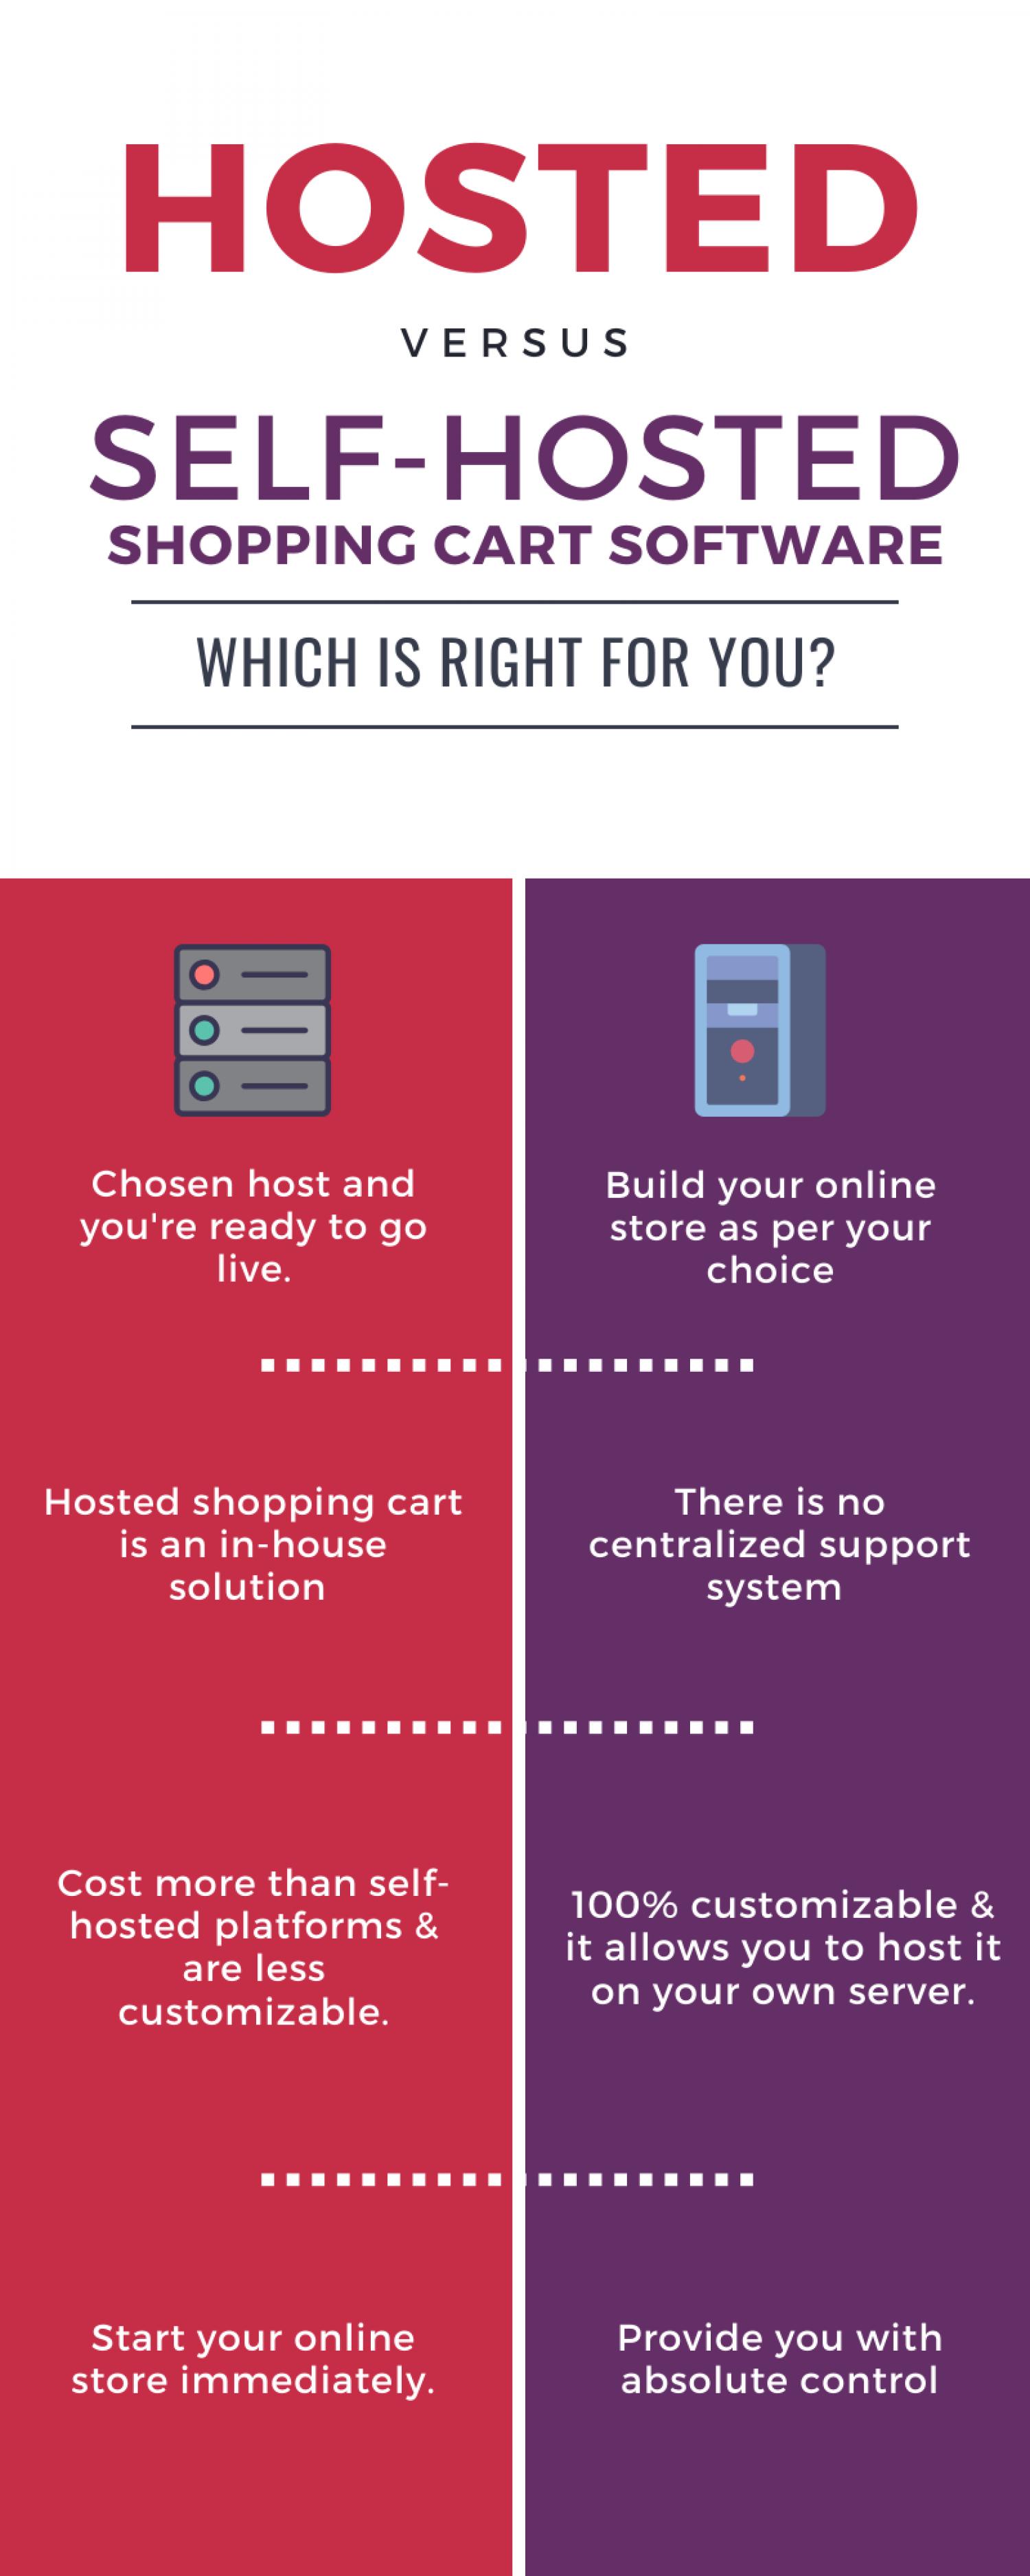 Hosted vs. Self-Hosted eCommerce Platforms